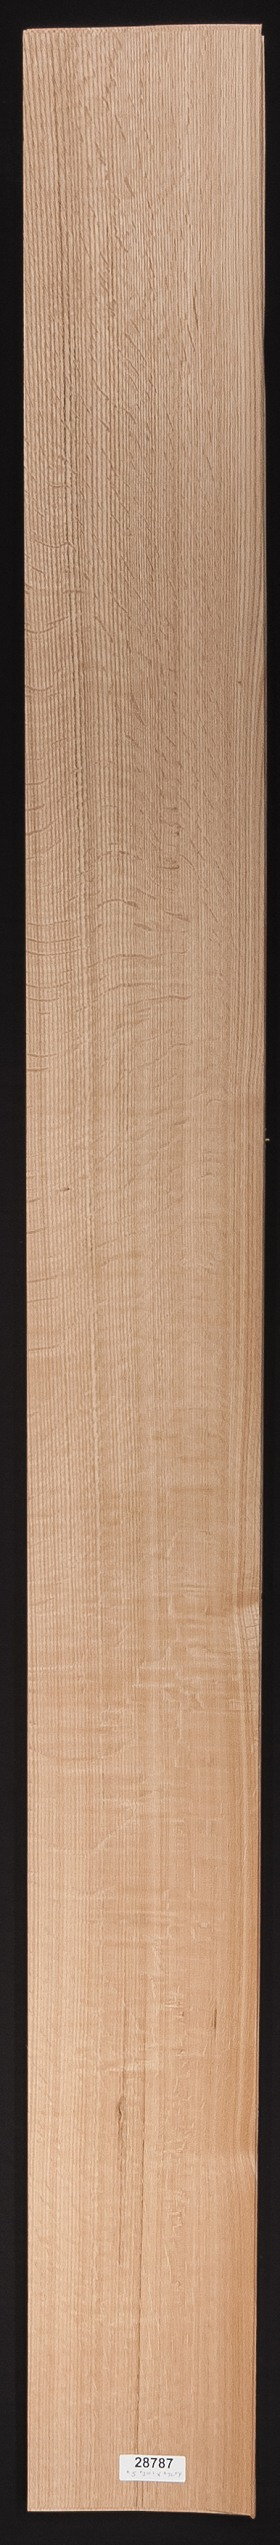 AAA Quartersawn Oak (Red) Veneer Sheet